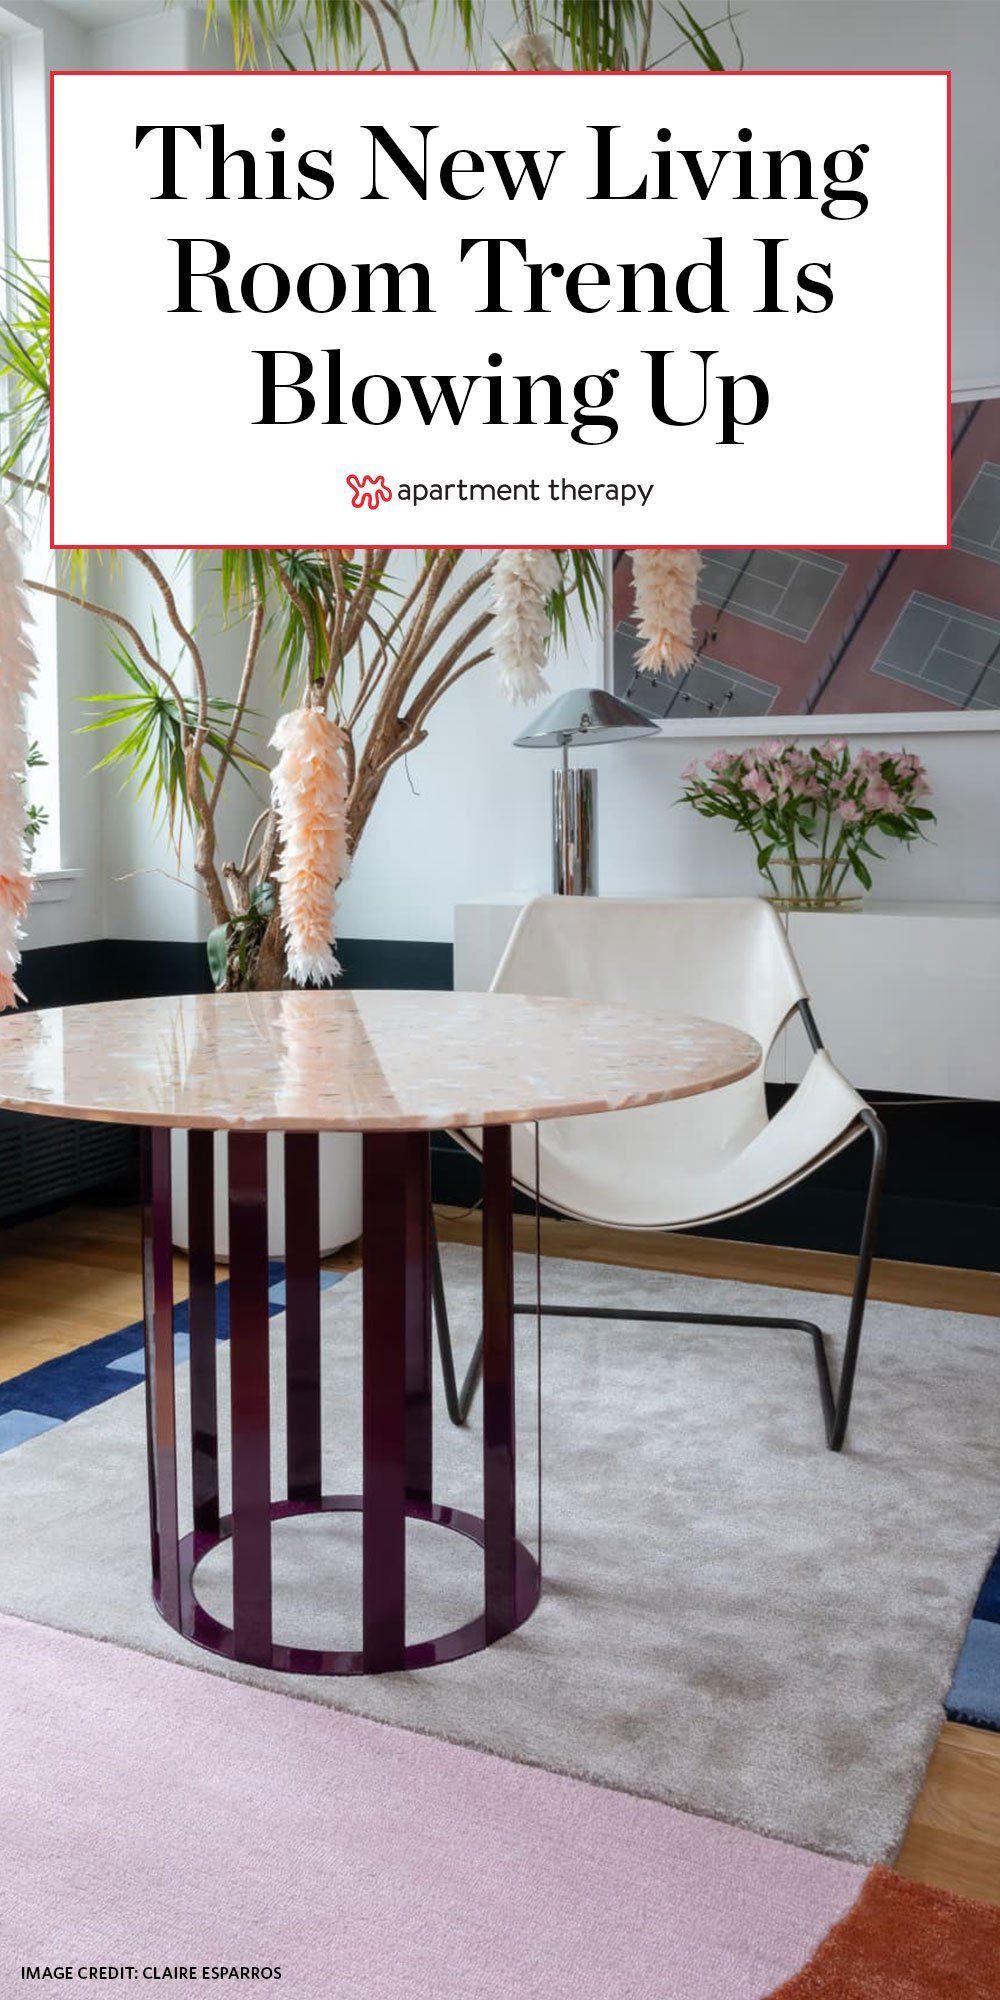 Epoxy Floors Diy Project Diy Epoxy Countertops And Floors Using Leggari Products Give Your Kitchen A Remo Metallic Epoxy Floor Epoxy Floor Diy Diy Flooring